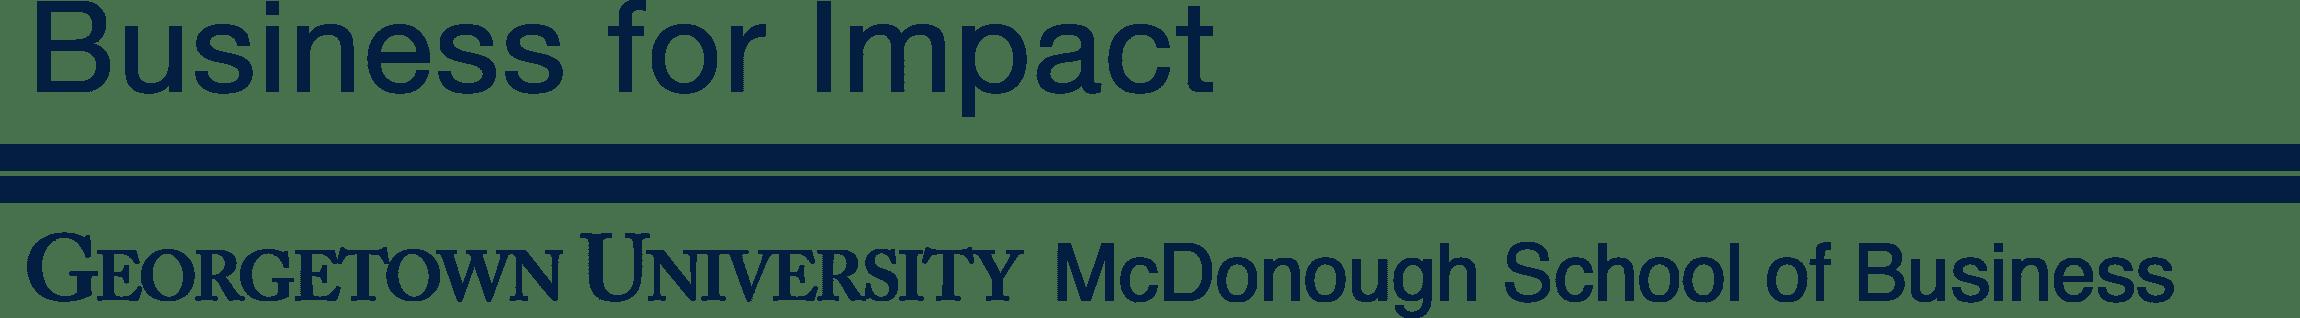 Georgetown University McDonough School of Business Logo